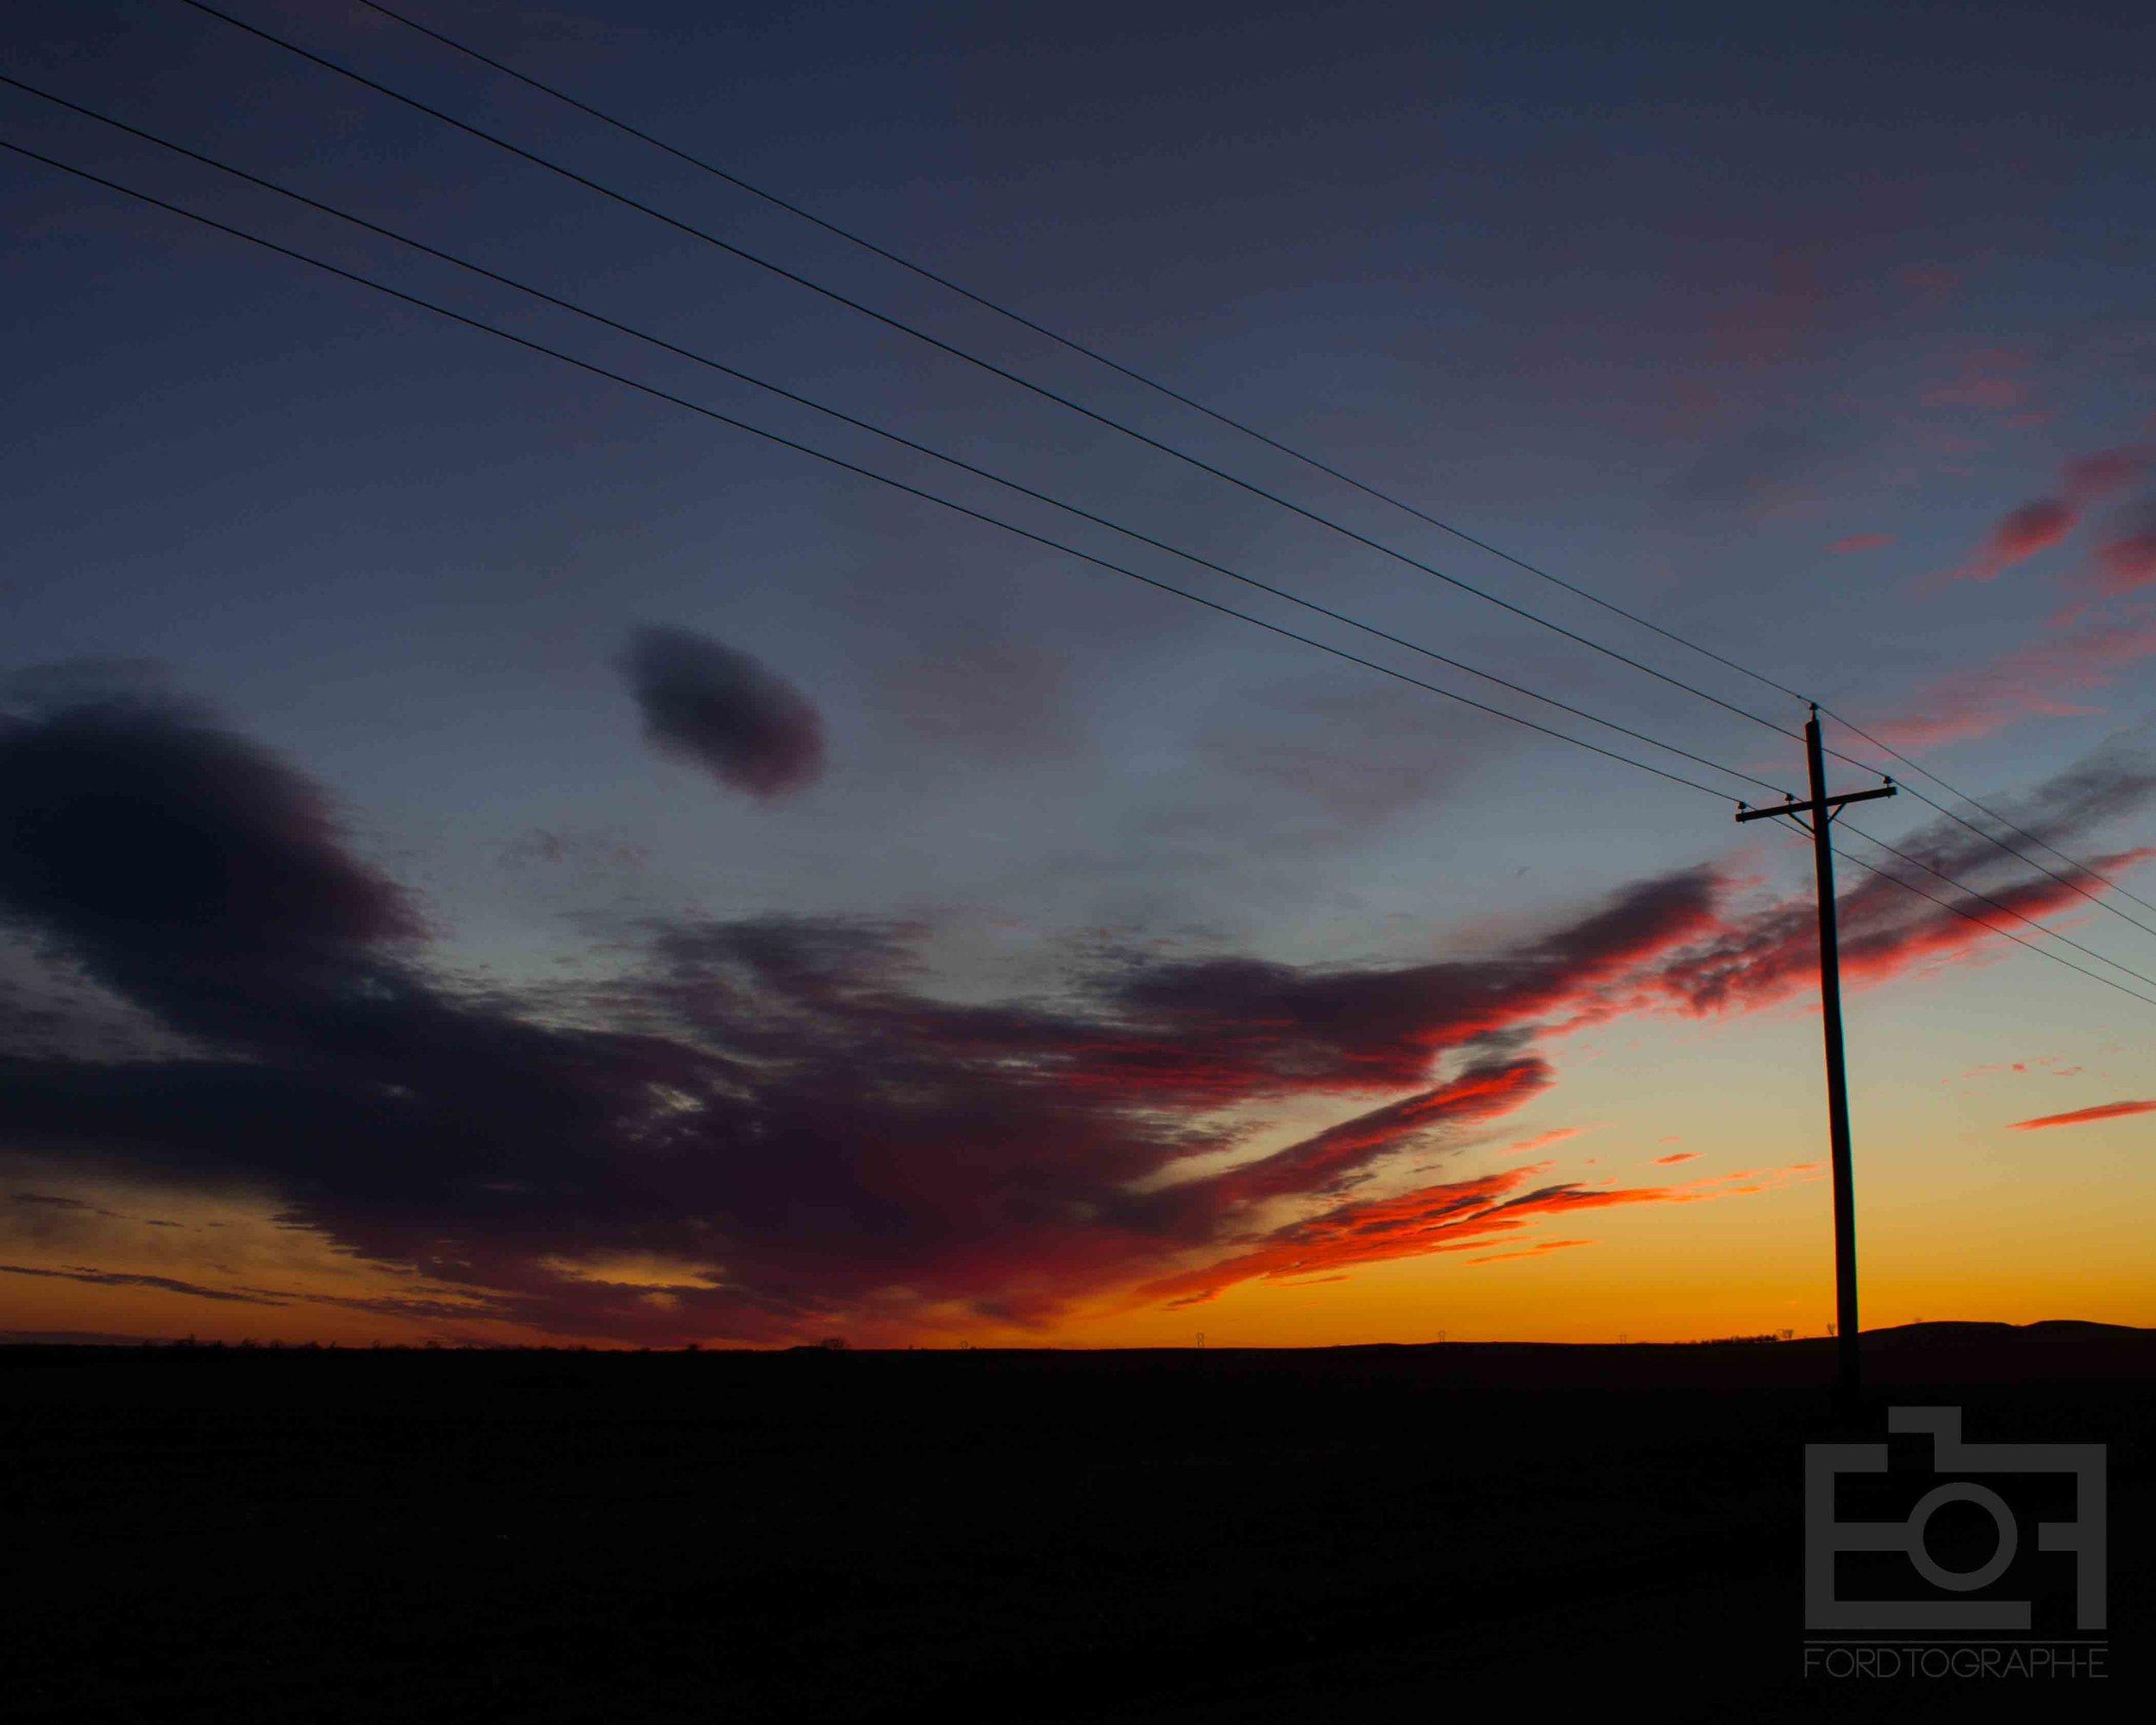 kansas-sunset-landscape-fordtographe-ericford-fineartphotography